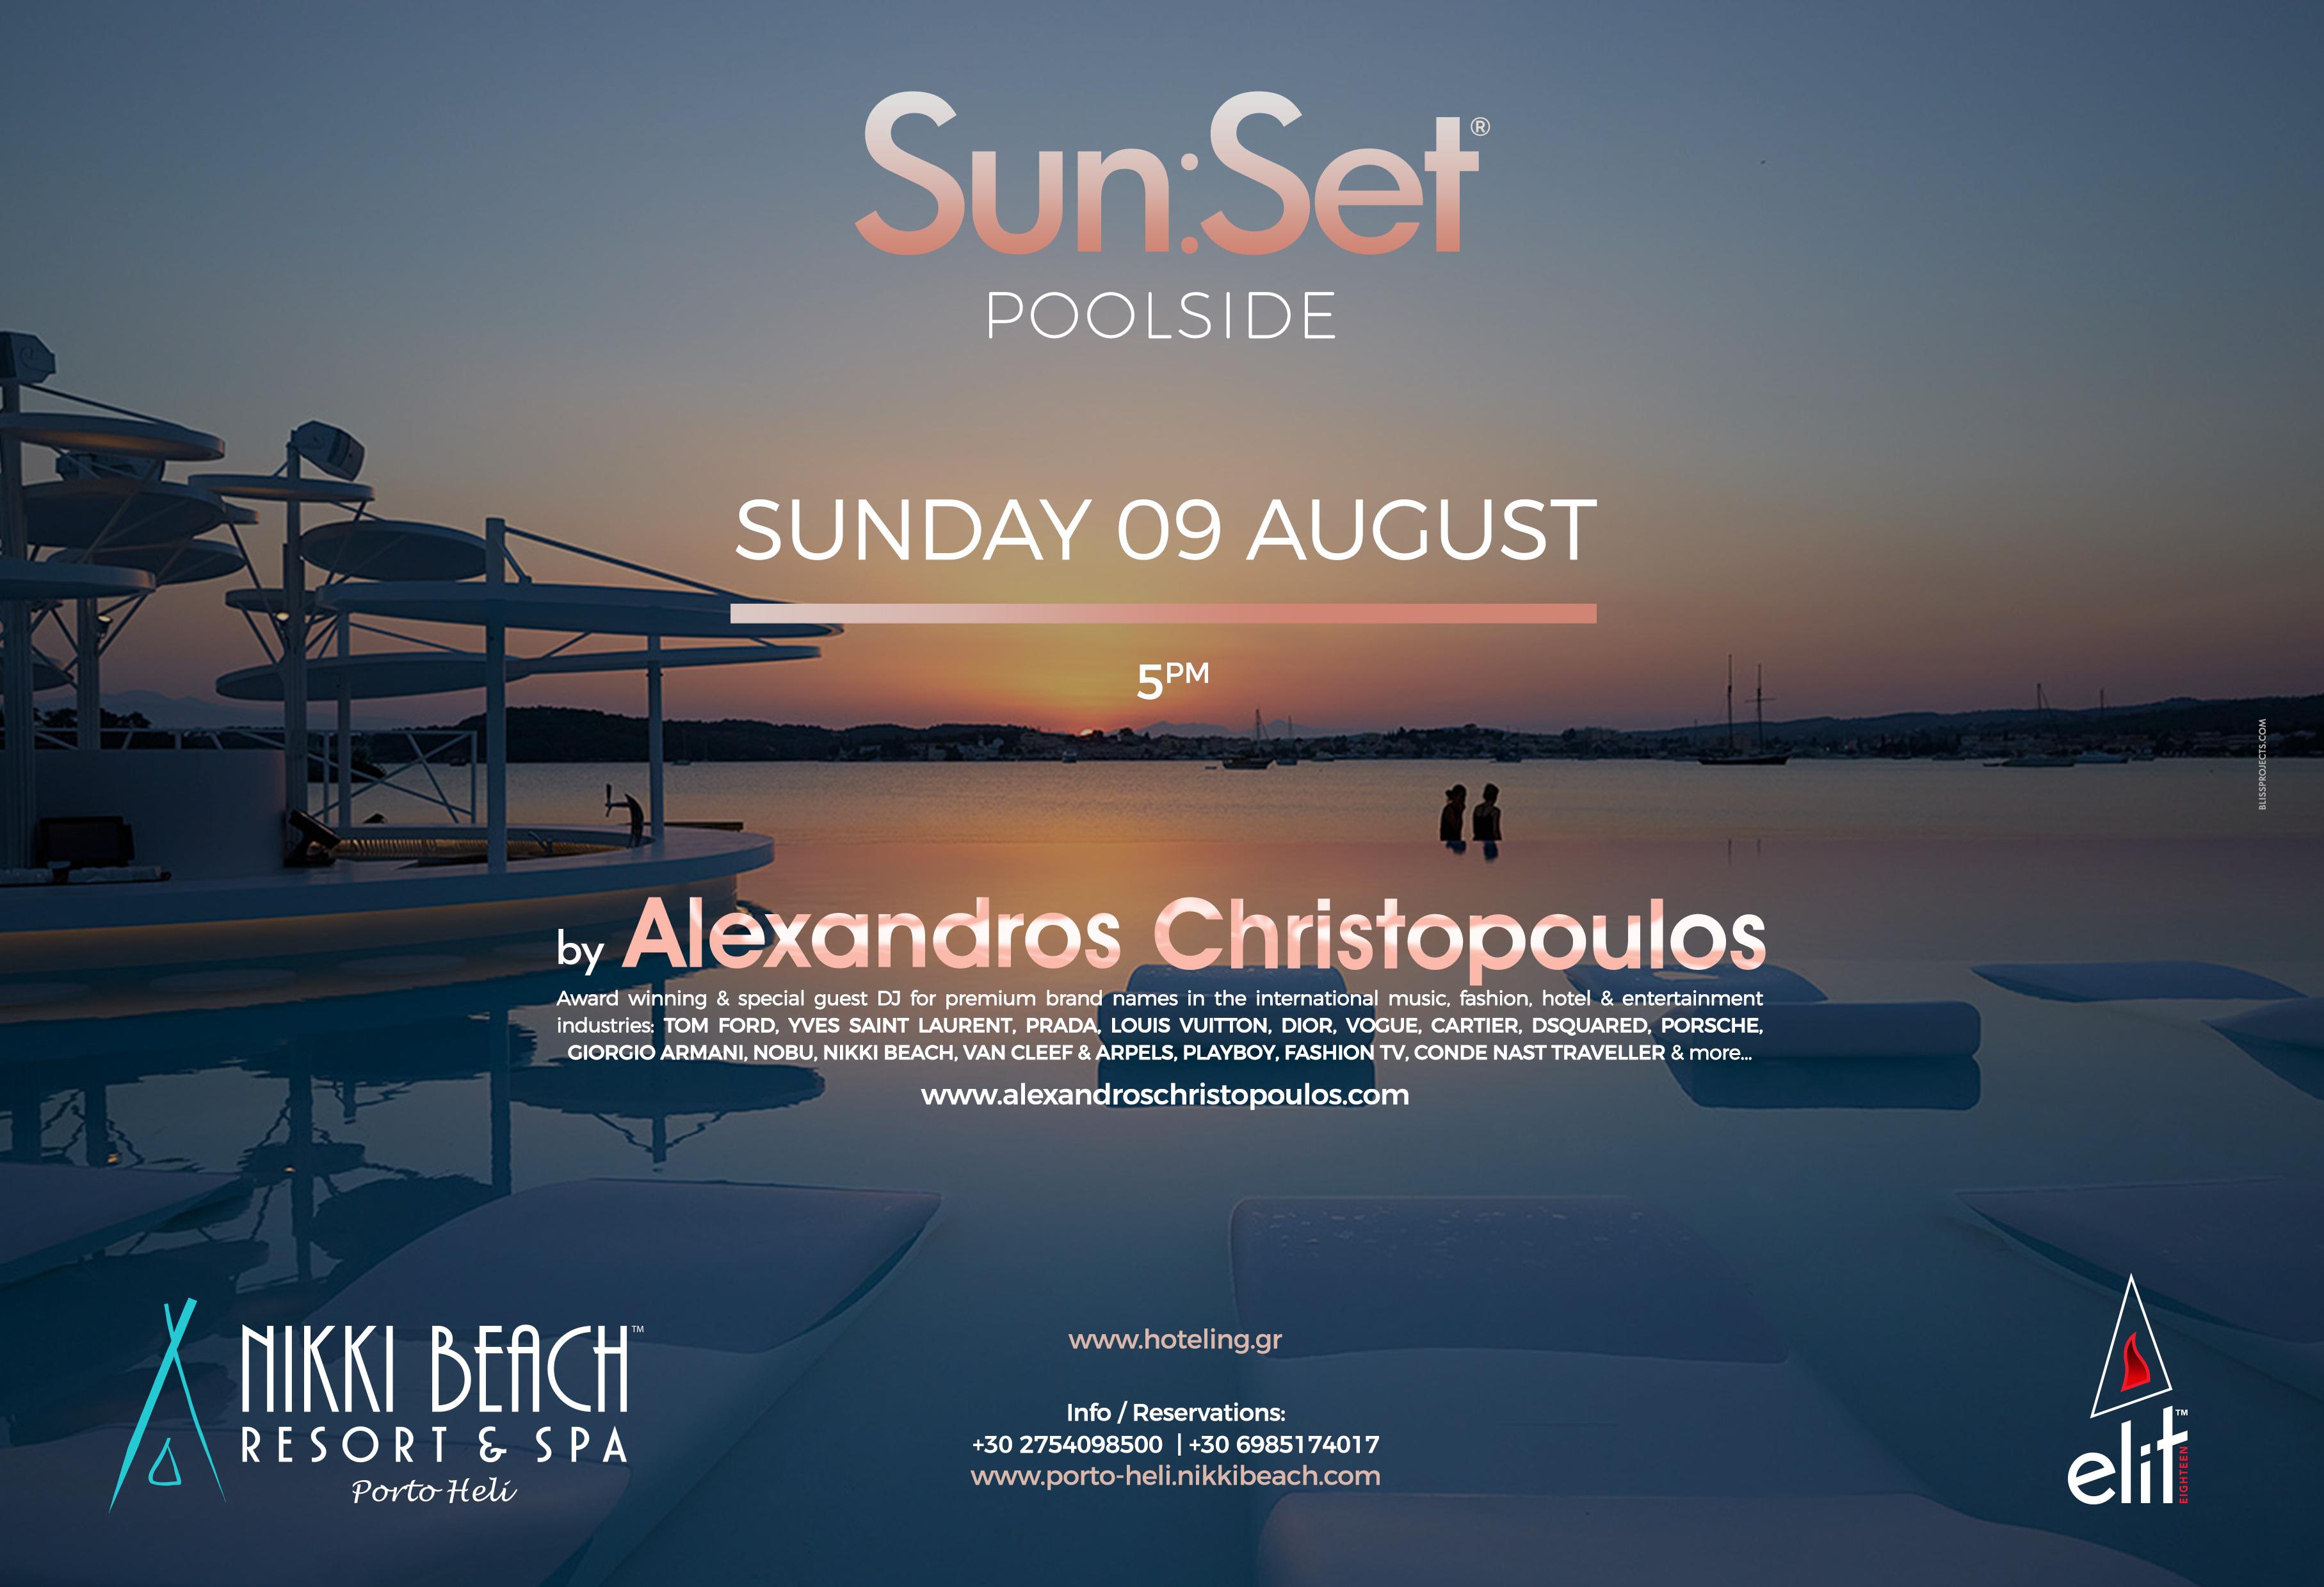 Sun:Set ® Poolside | NIKKI BEACH